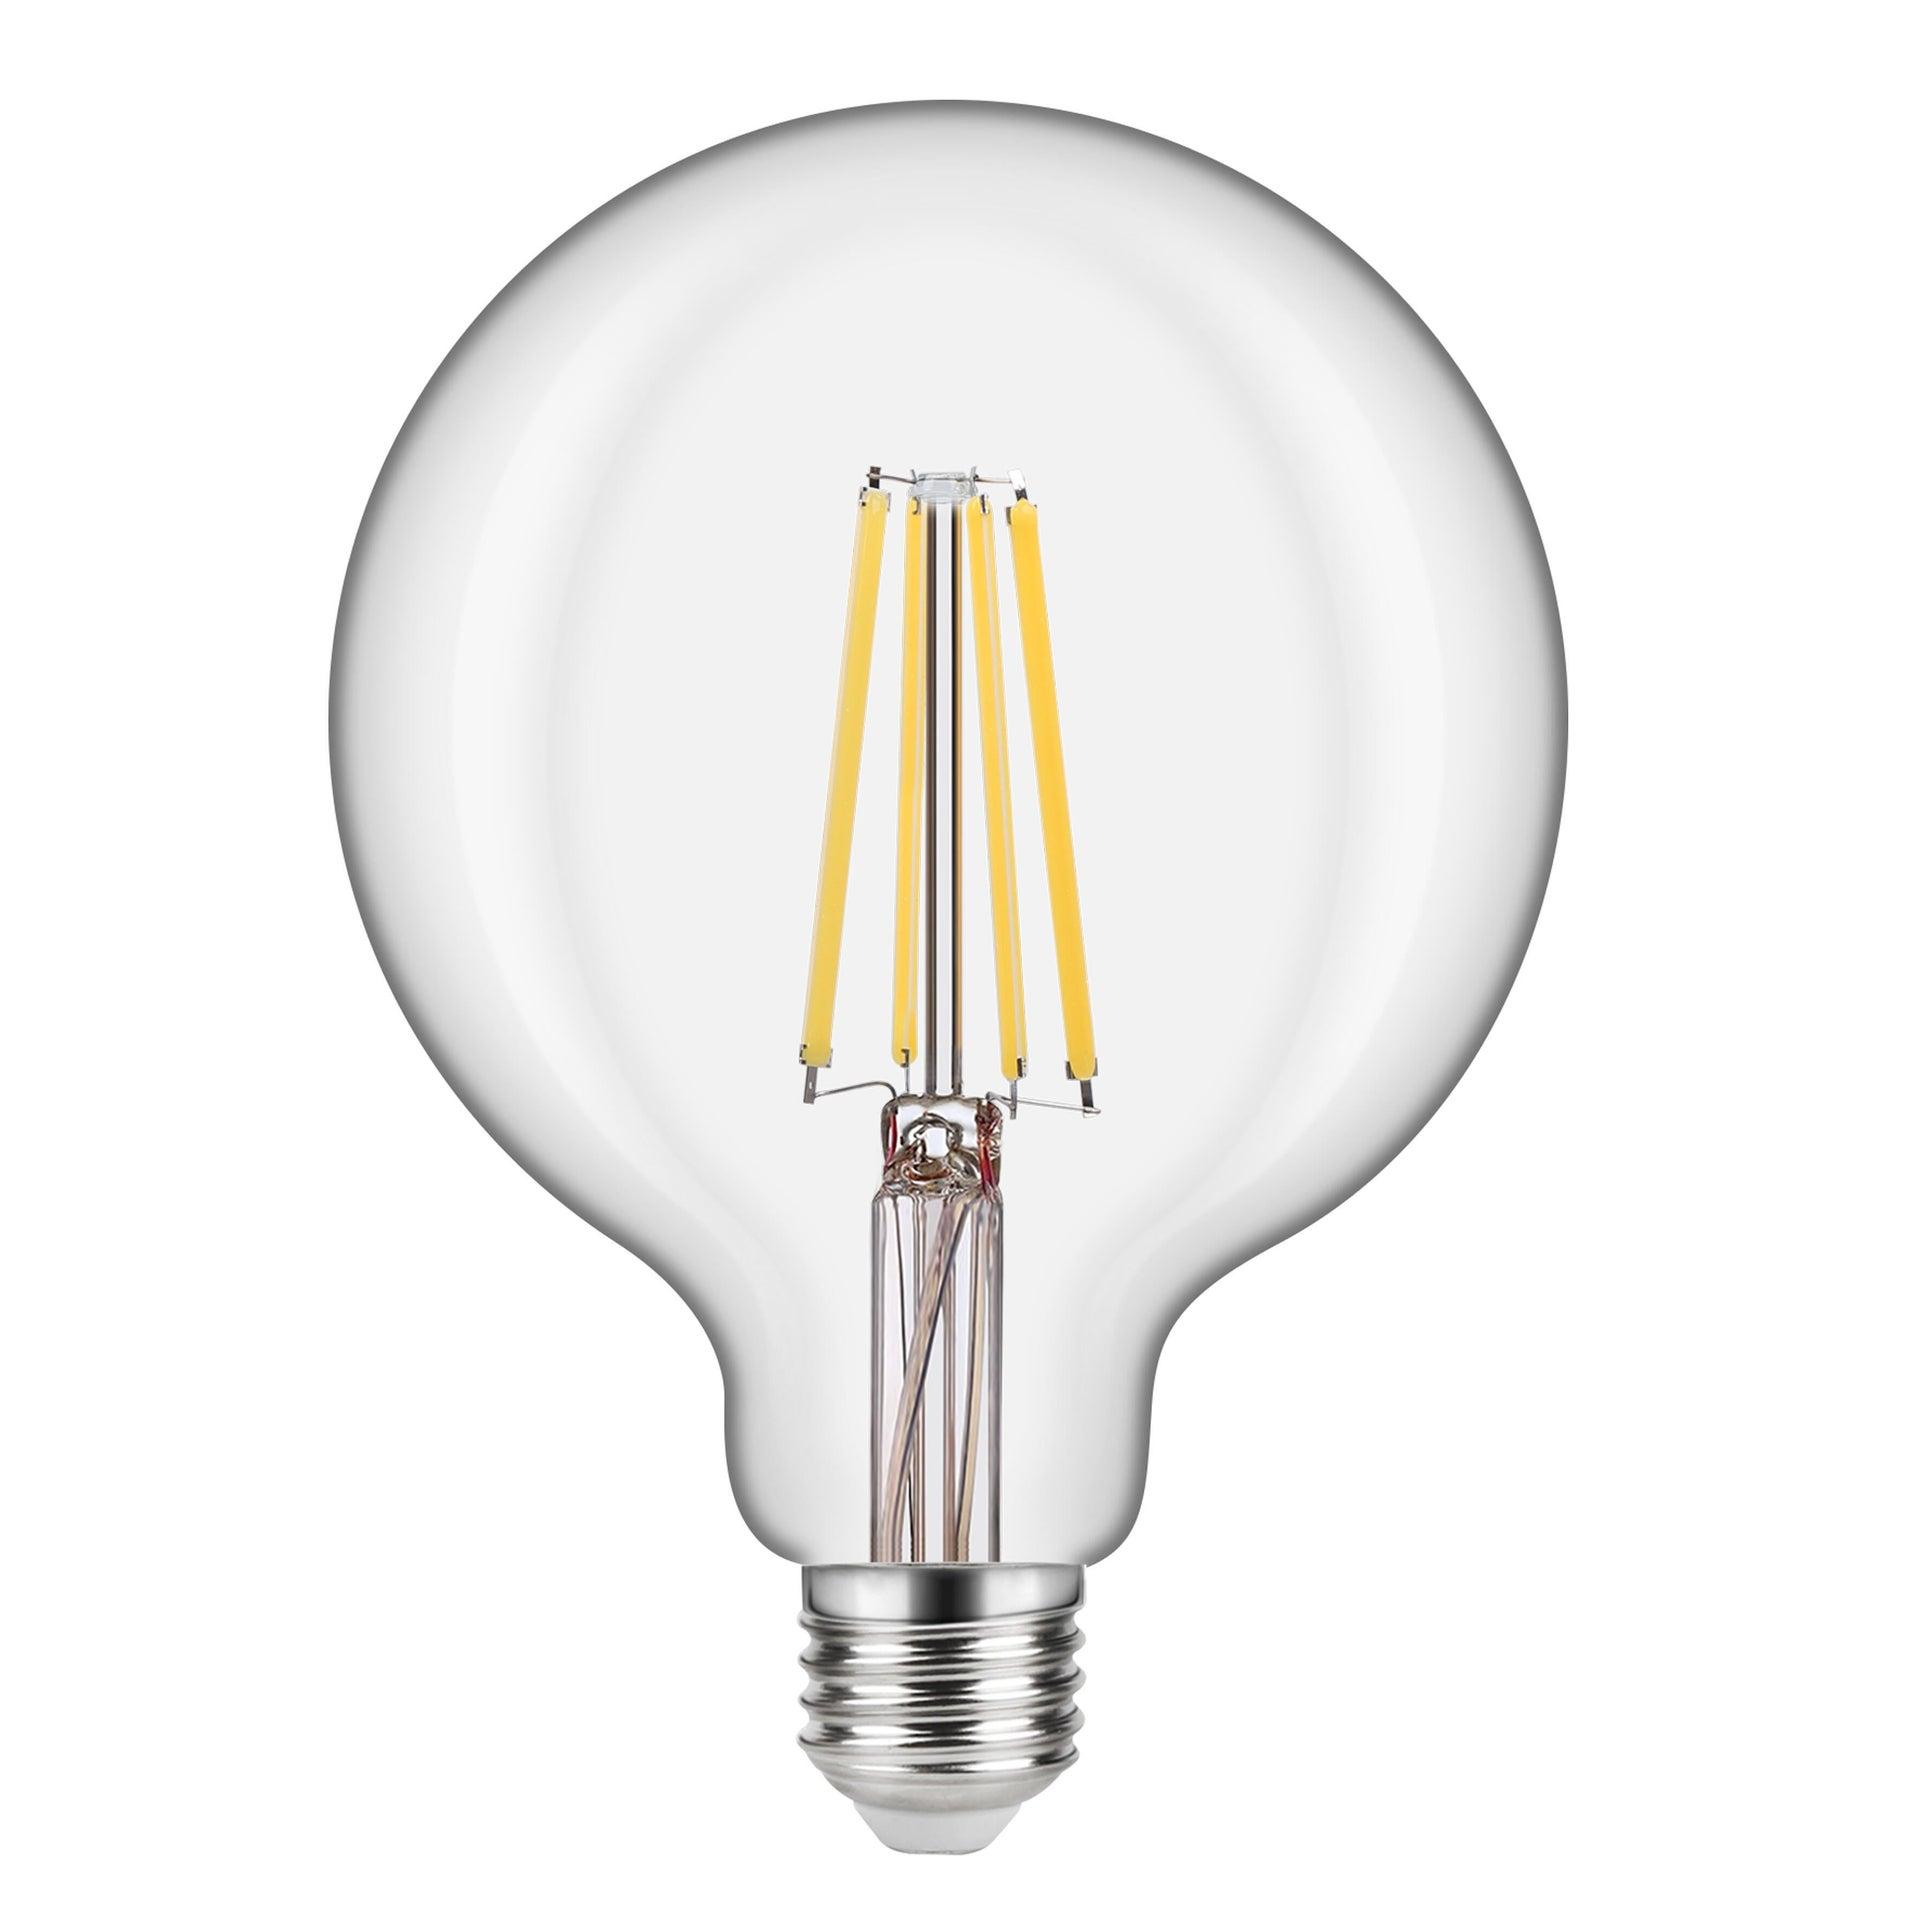 Lampadina LED filamento, E27, Globo, Trasparente, Luce calda, 10.5W=1521LM (equiv 100 W), 360° , LEXMAN - 1